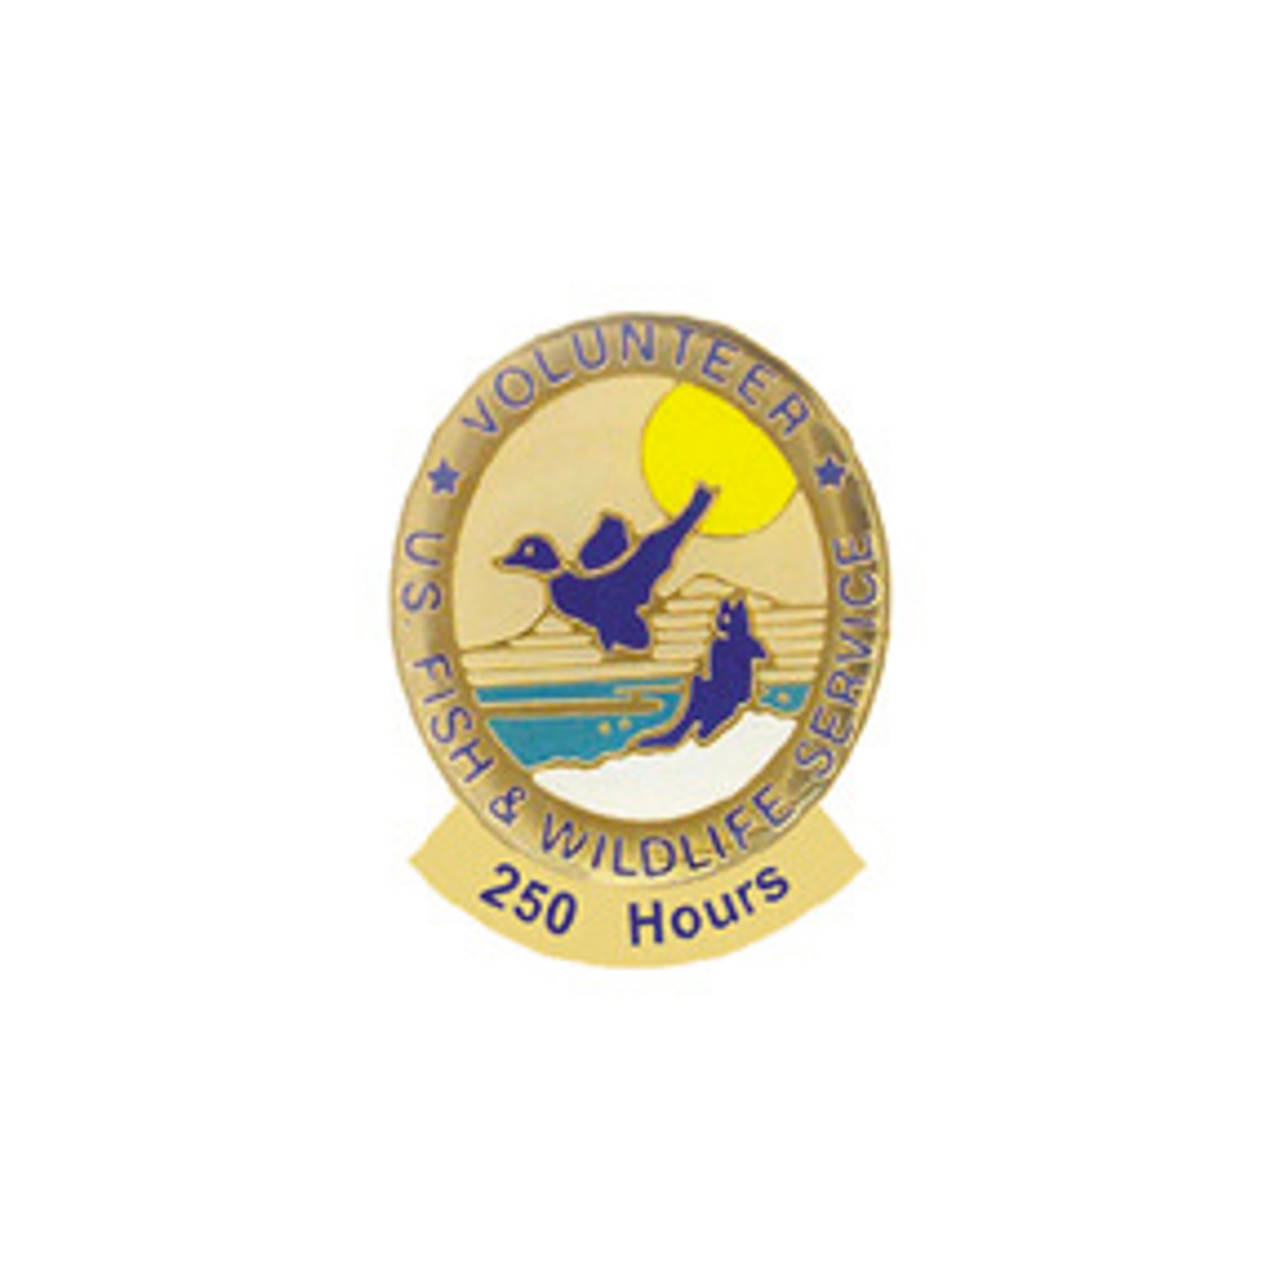 Fish & Wildlife Volunteer Hours Pin (6000 hours)